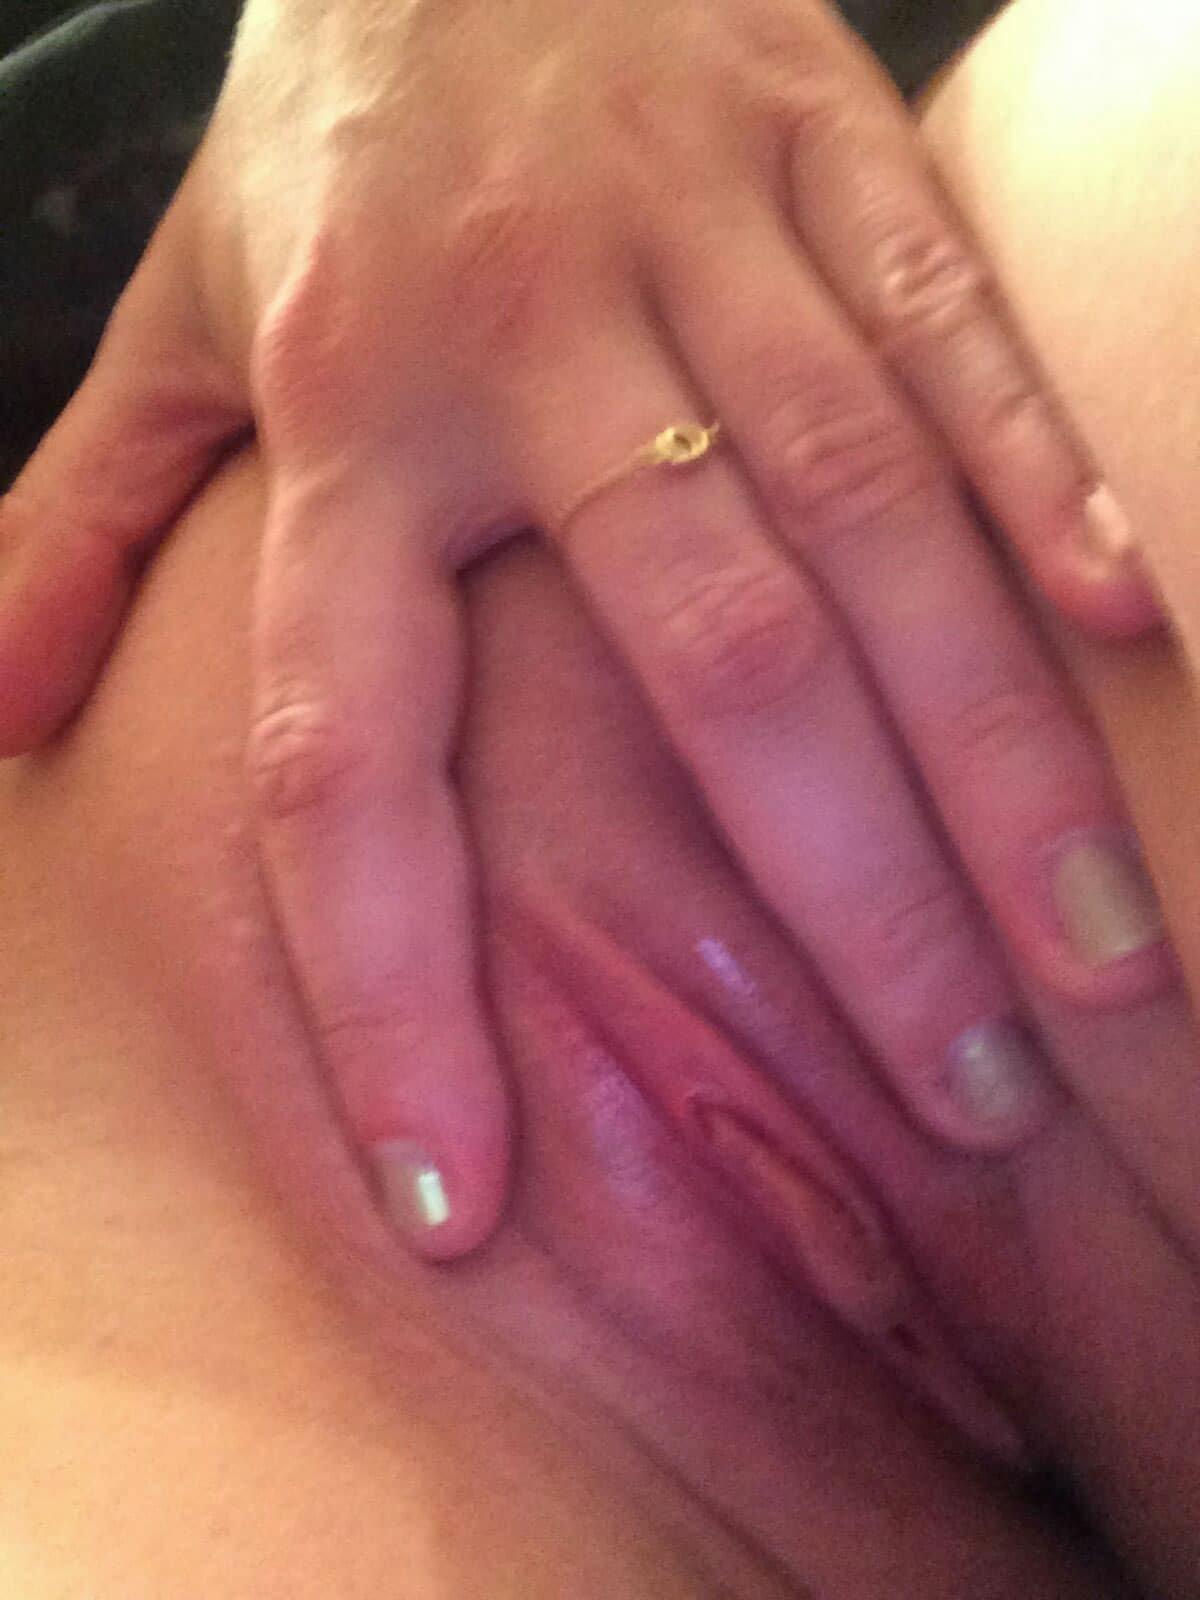 Amanda Michalka Sex aj michalka nude fappening pics! - leaked pie